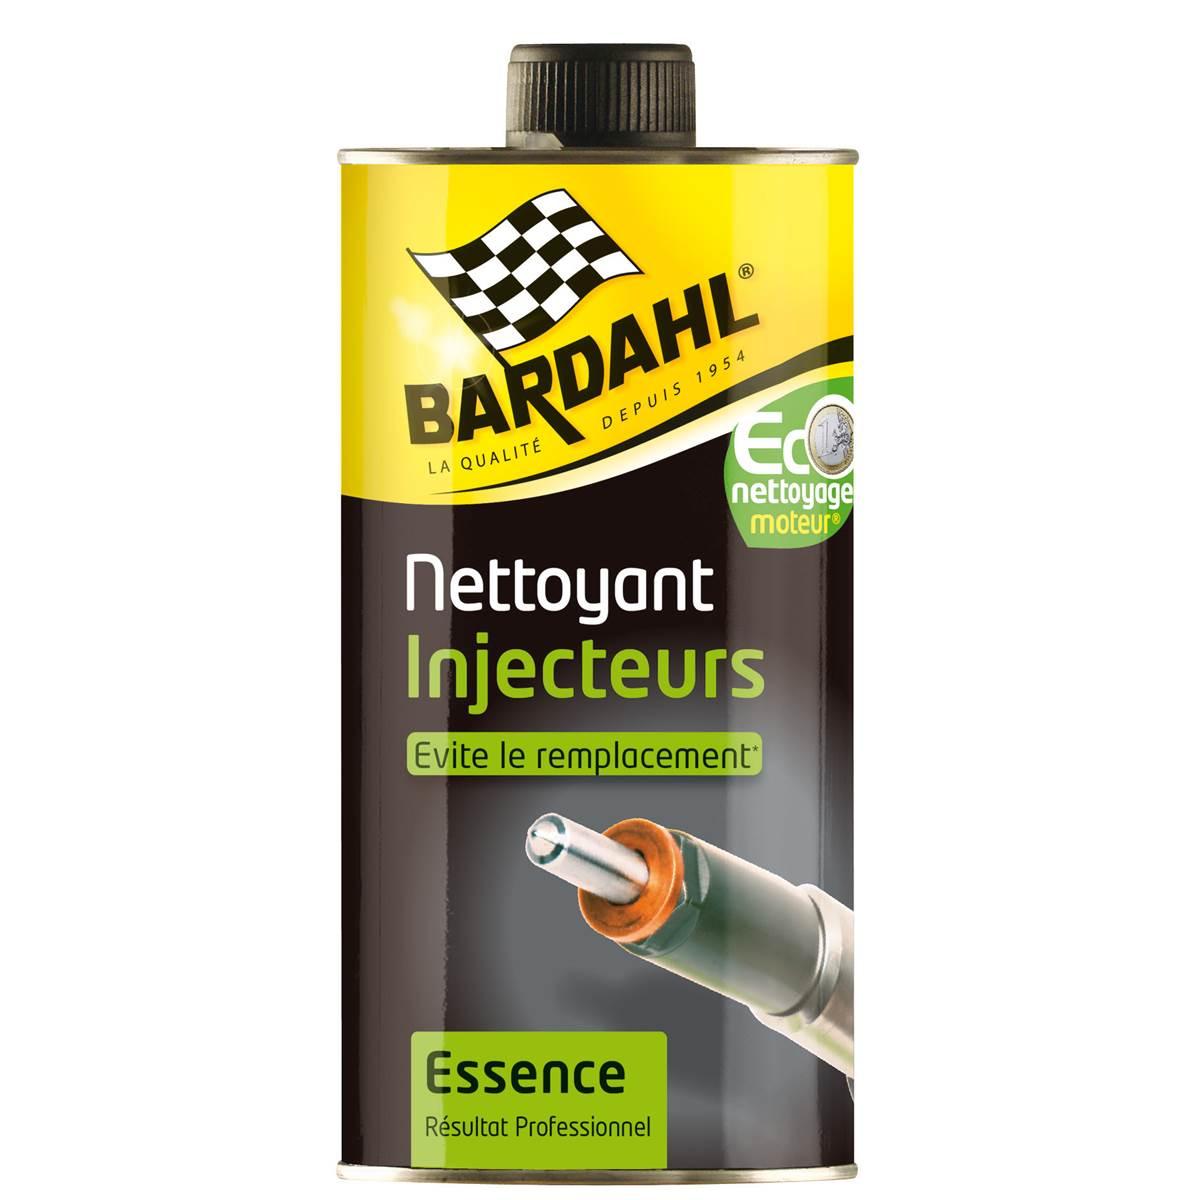 Nettoyant injecteurs Essence Bardahl 1 L